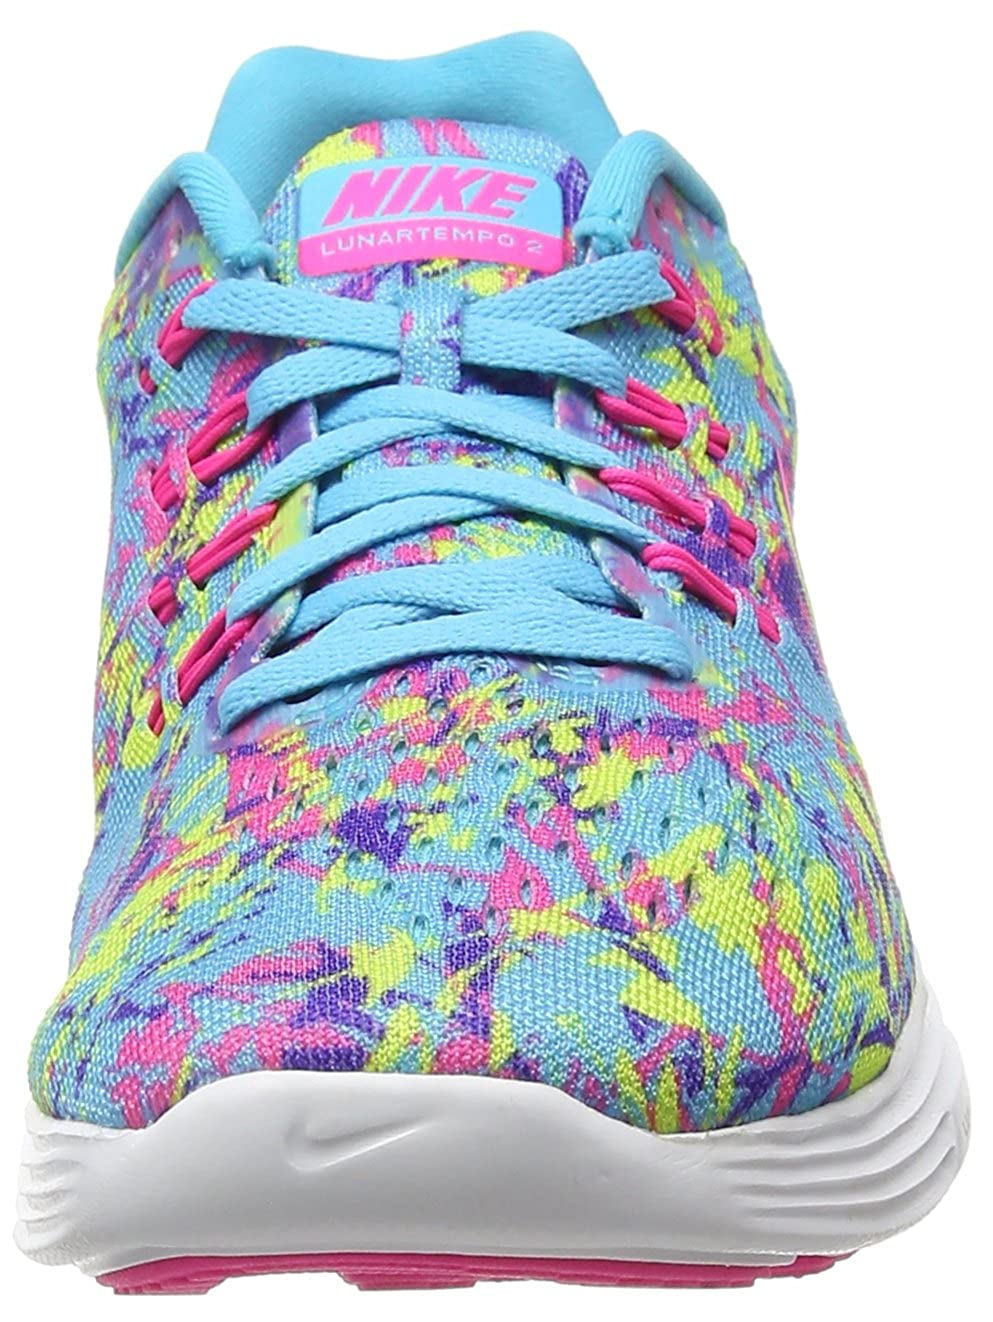 meet 42914 89117 Amazon.com   Nike Lunartempo 2 Print Gamma Blue Volt Persian Violet Pink  Blast Women s Running Shoes   Road Running